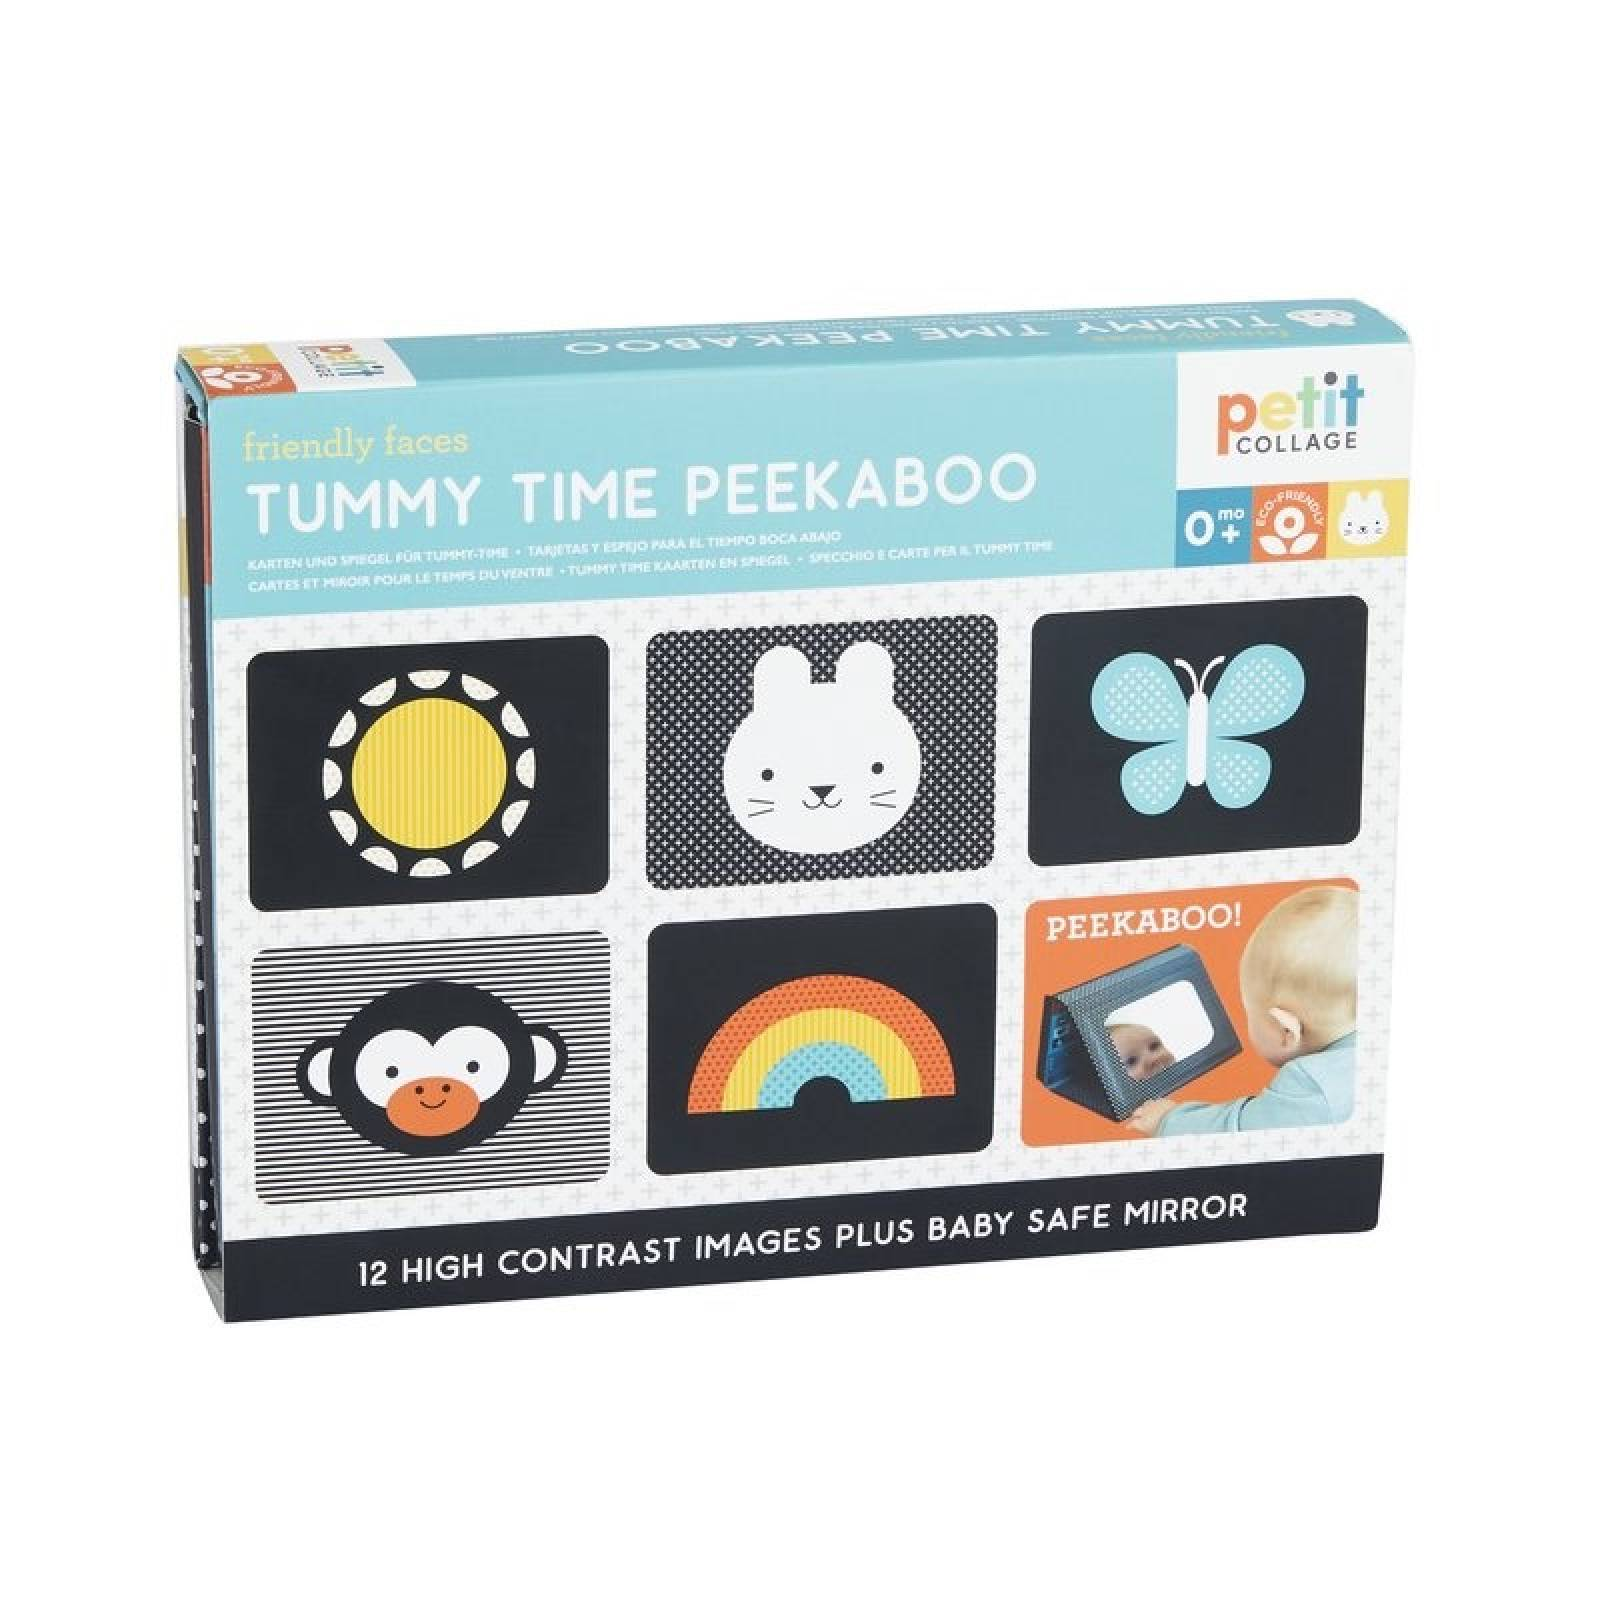 Tummy Time Peekaboo Baby Toy 0+